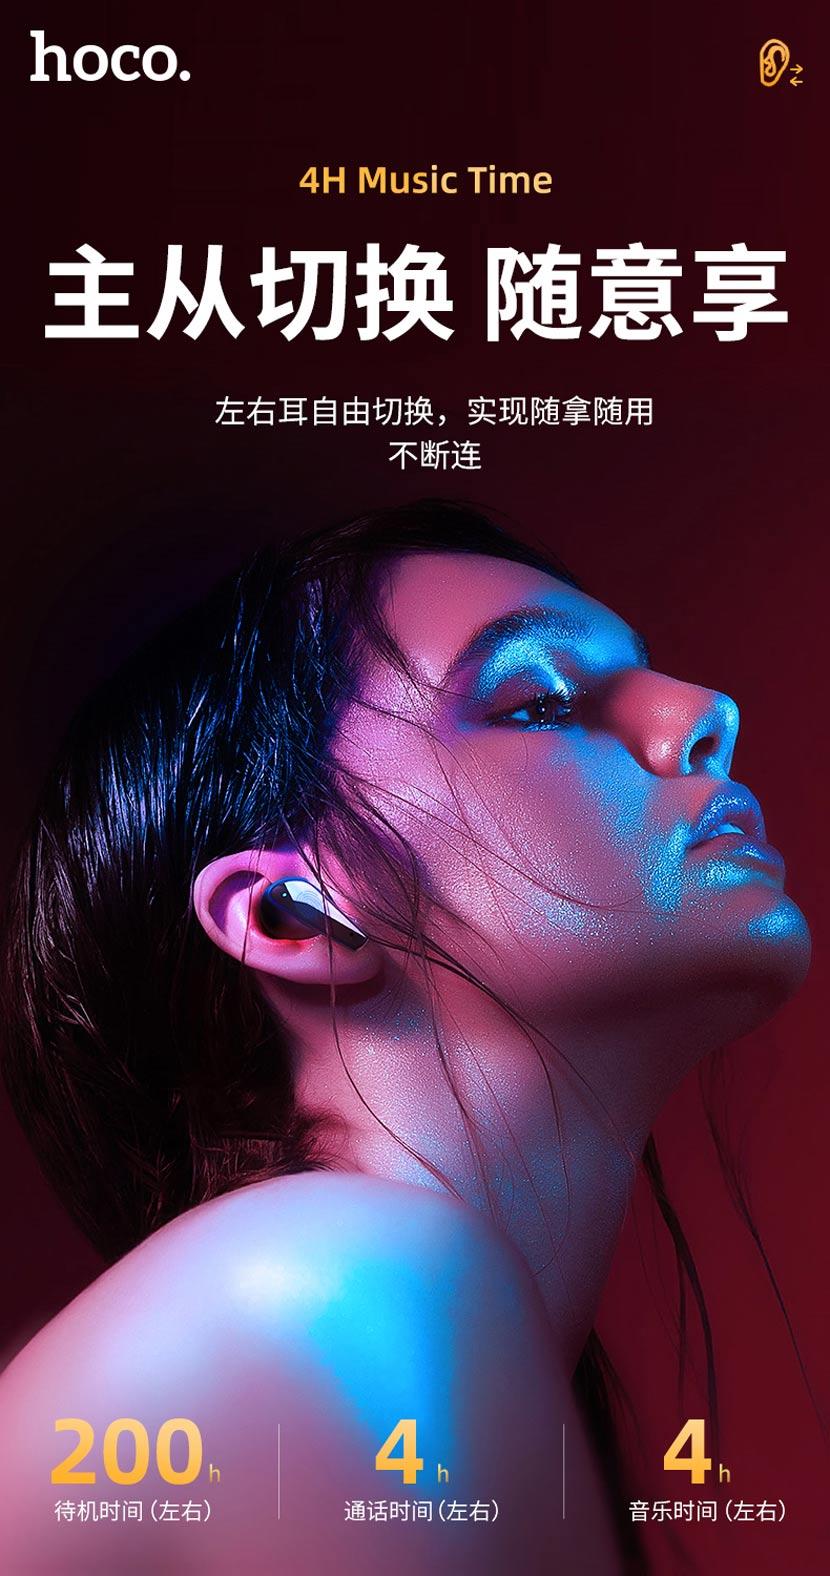 hoco news es43 lucky sound tws wireless headset leader follower cn